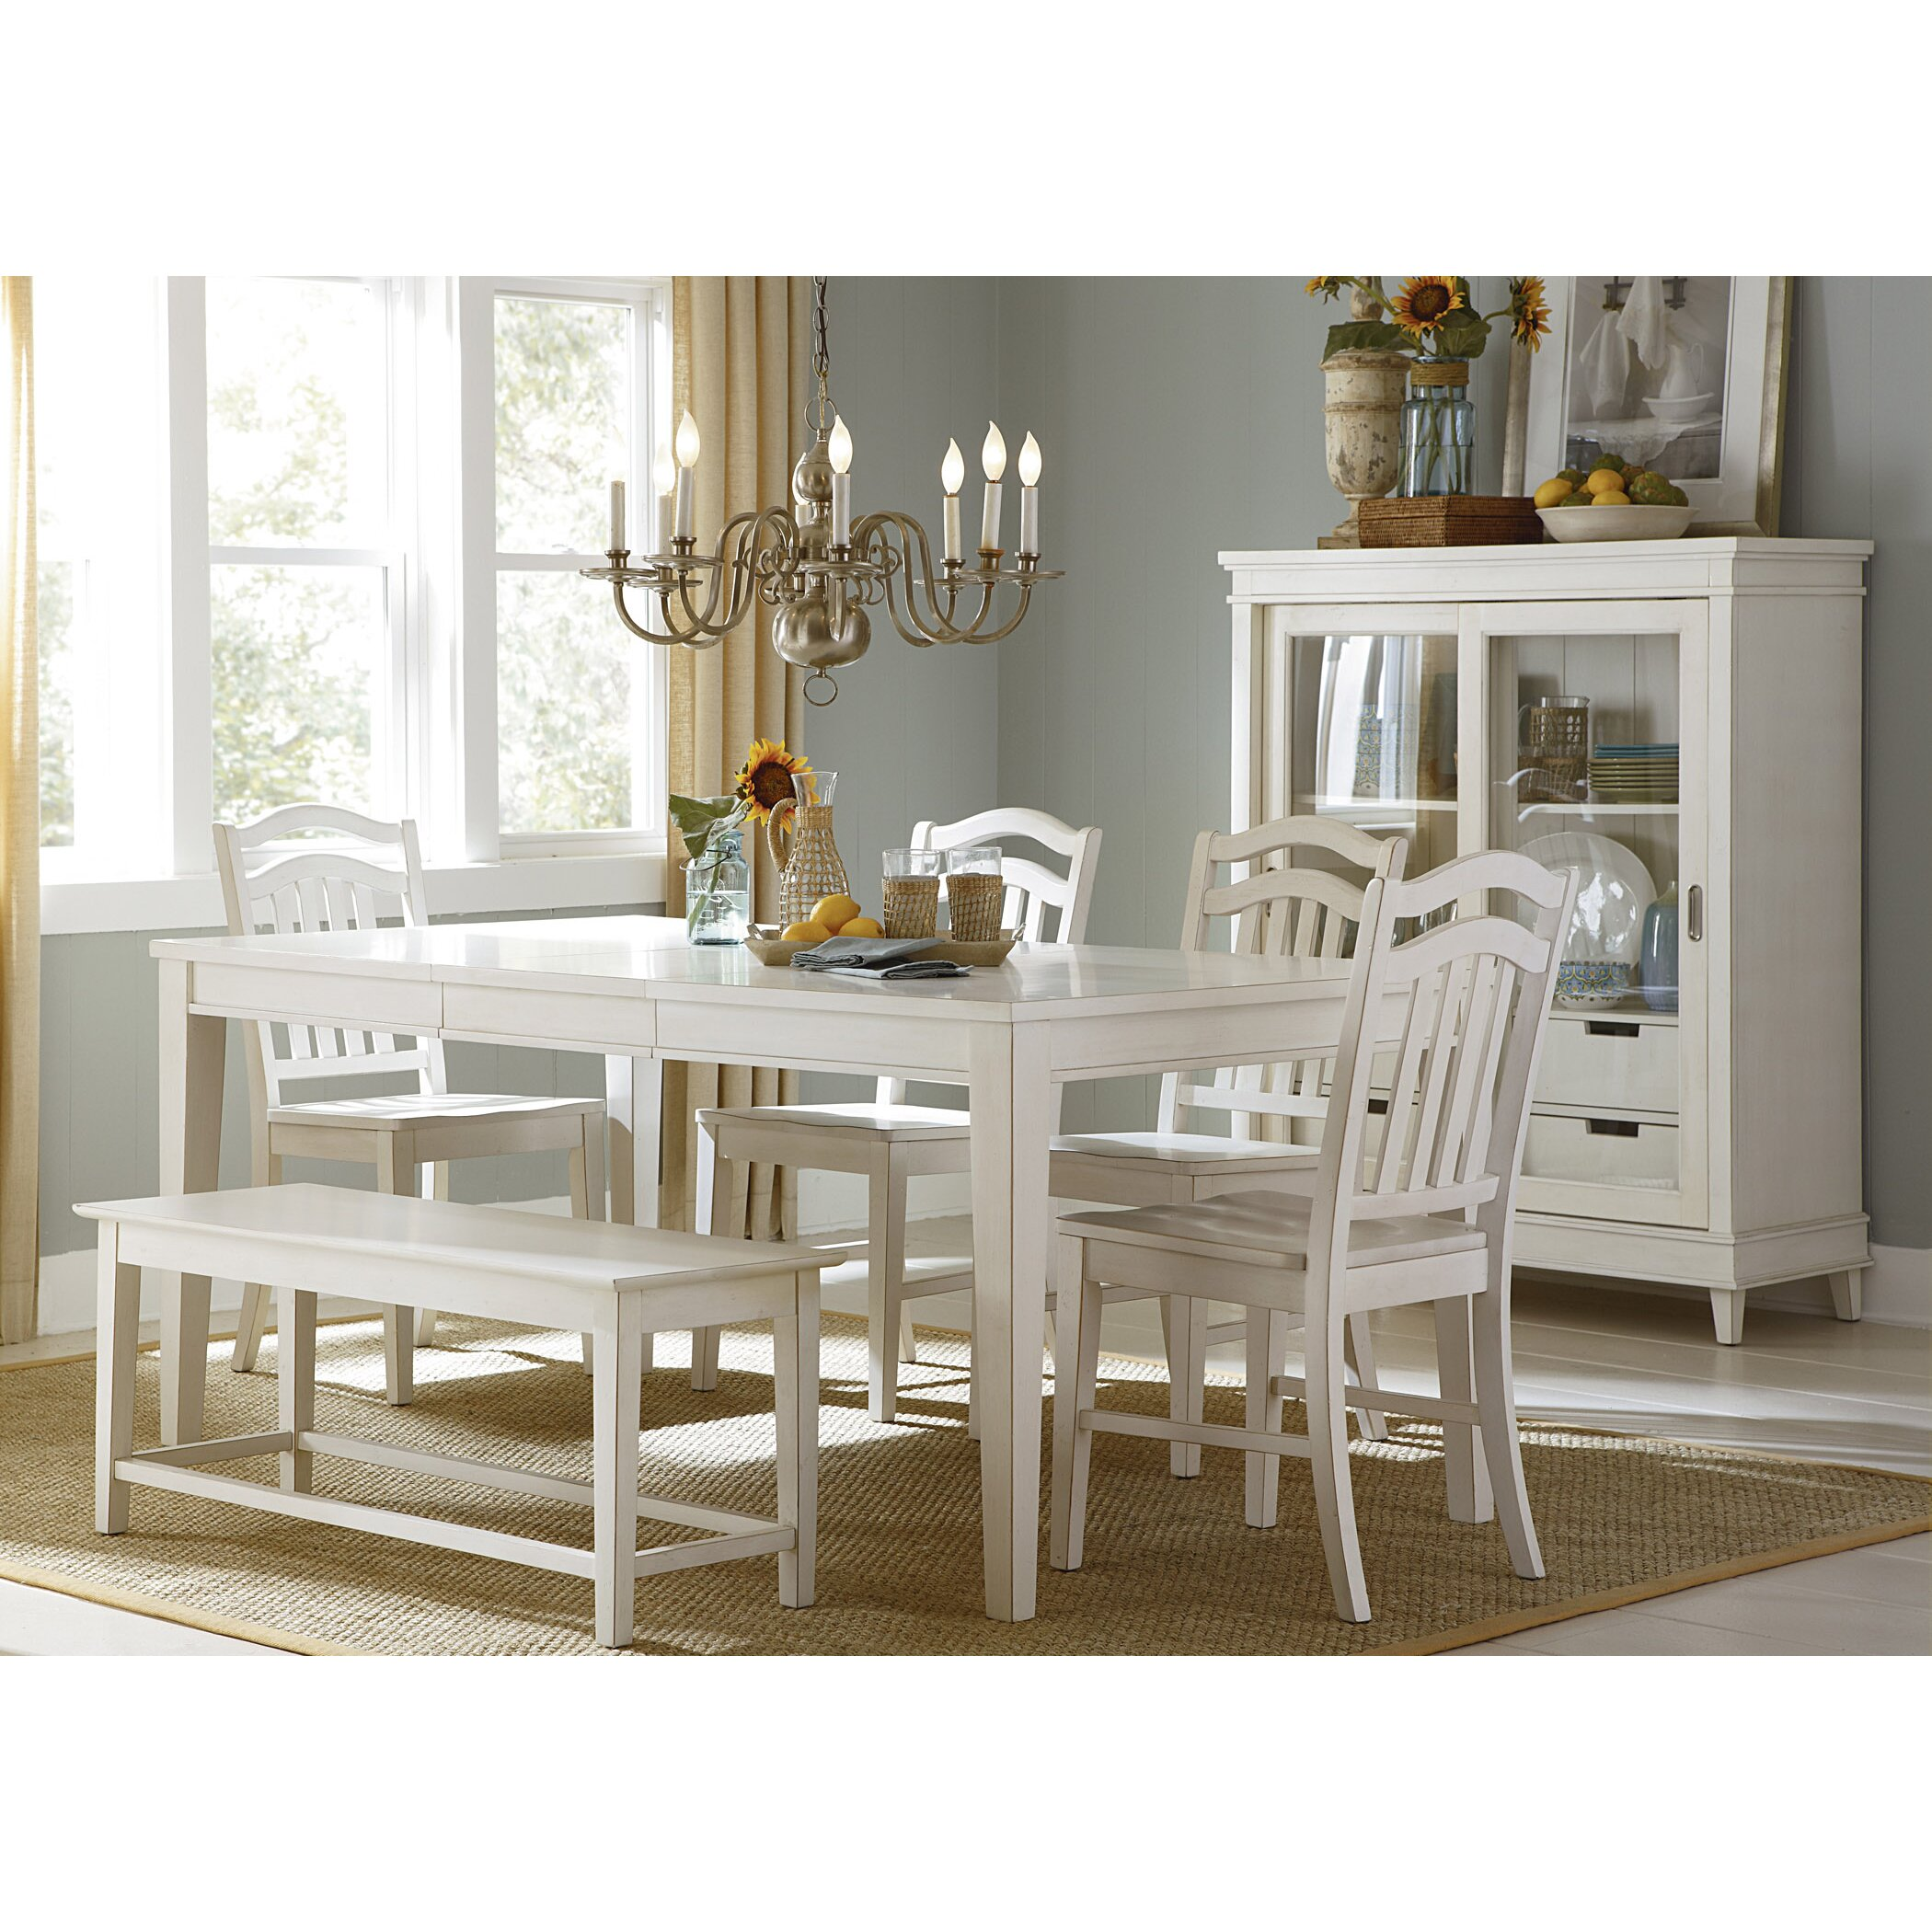 Bobs Furniture Kitchen Sets White Kitchen Dining Room Sets Youll Love Wayfair